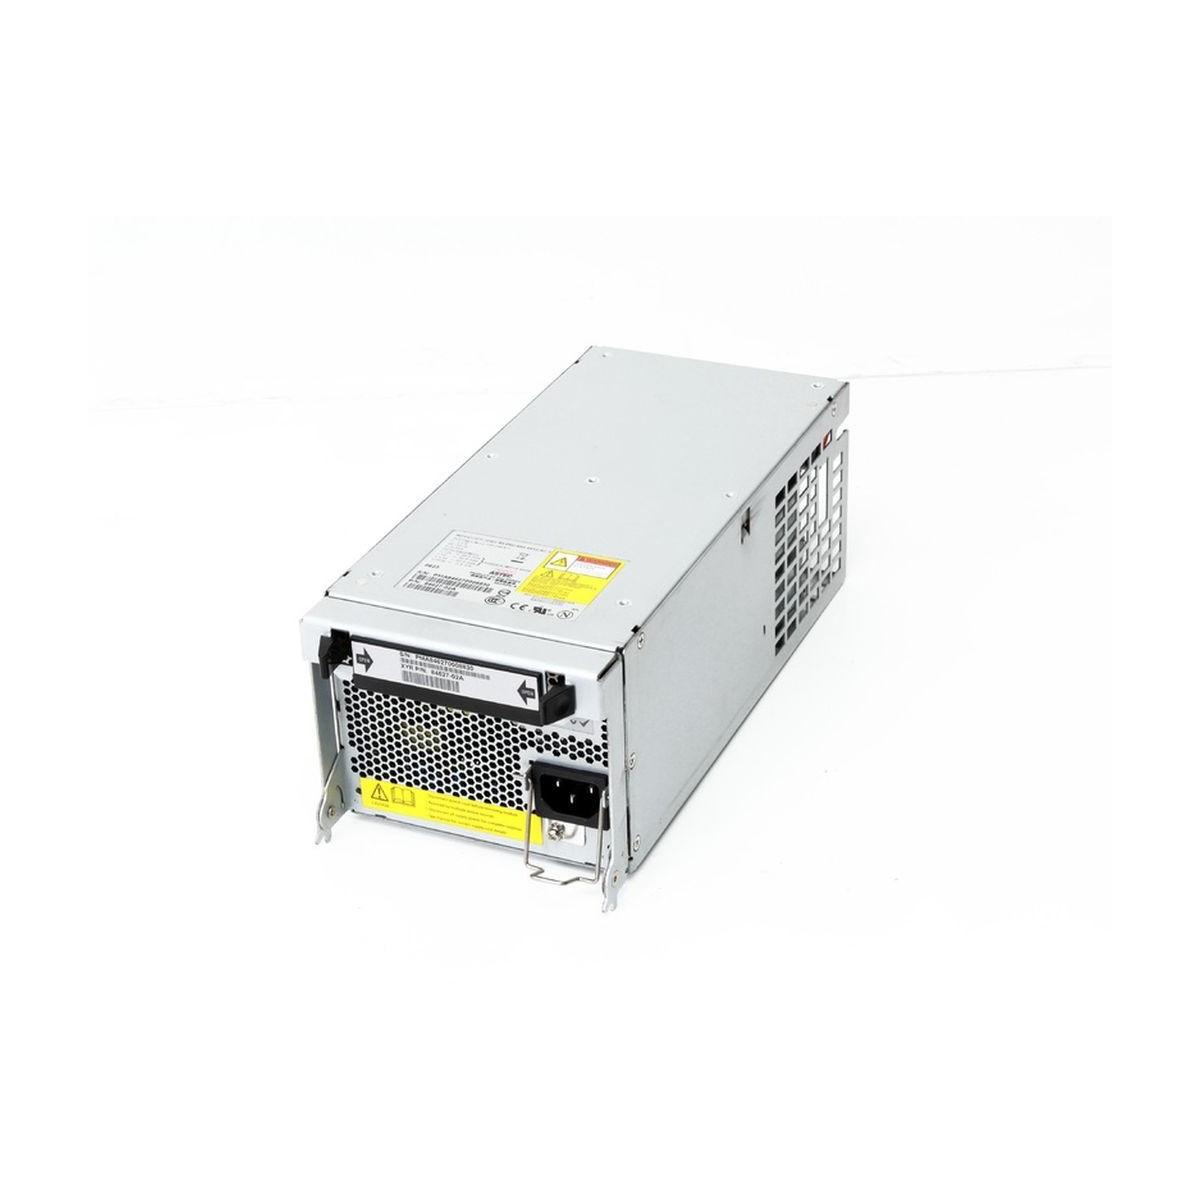 ZASILACZ DELL ASTEC PS6500 440W RS-PSU-450-4835-AC